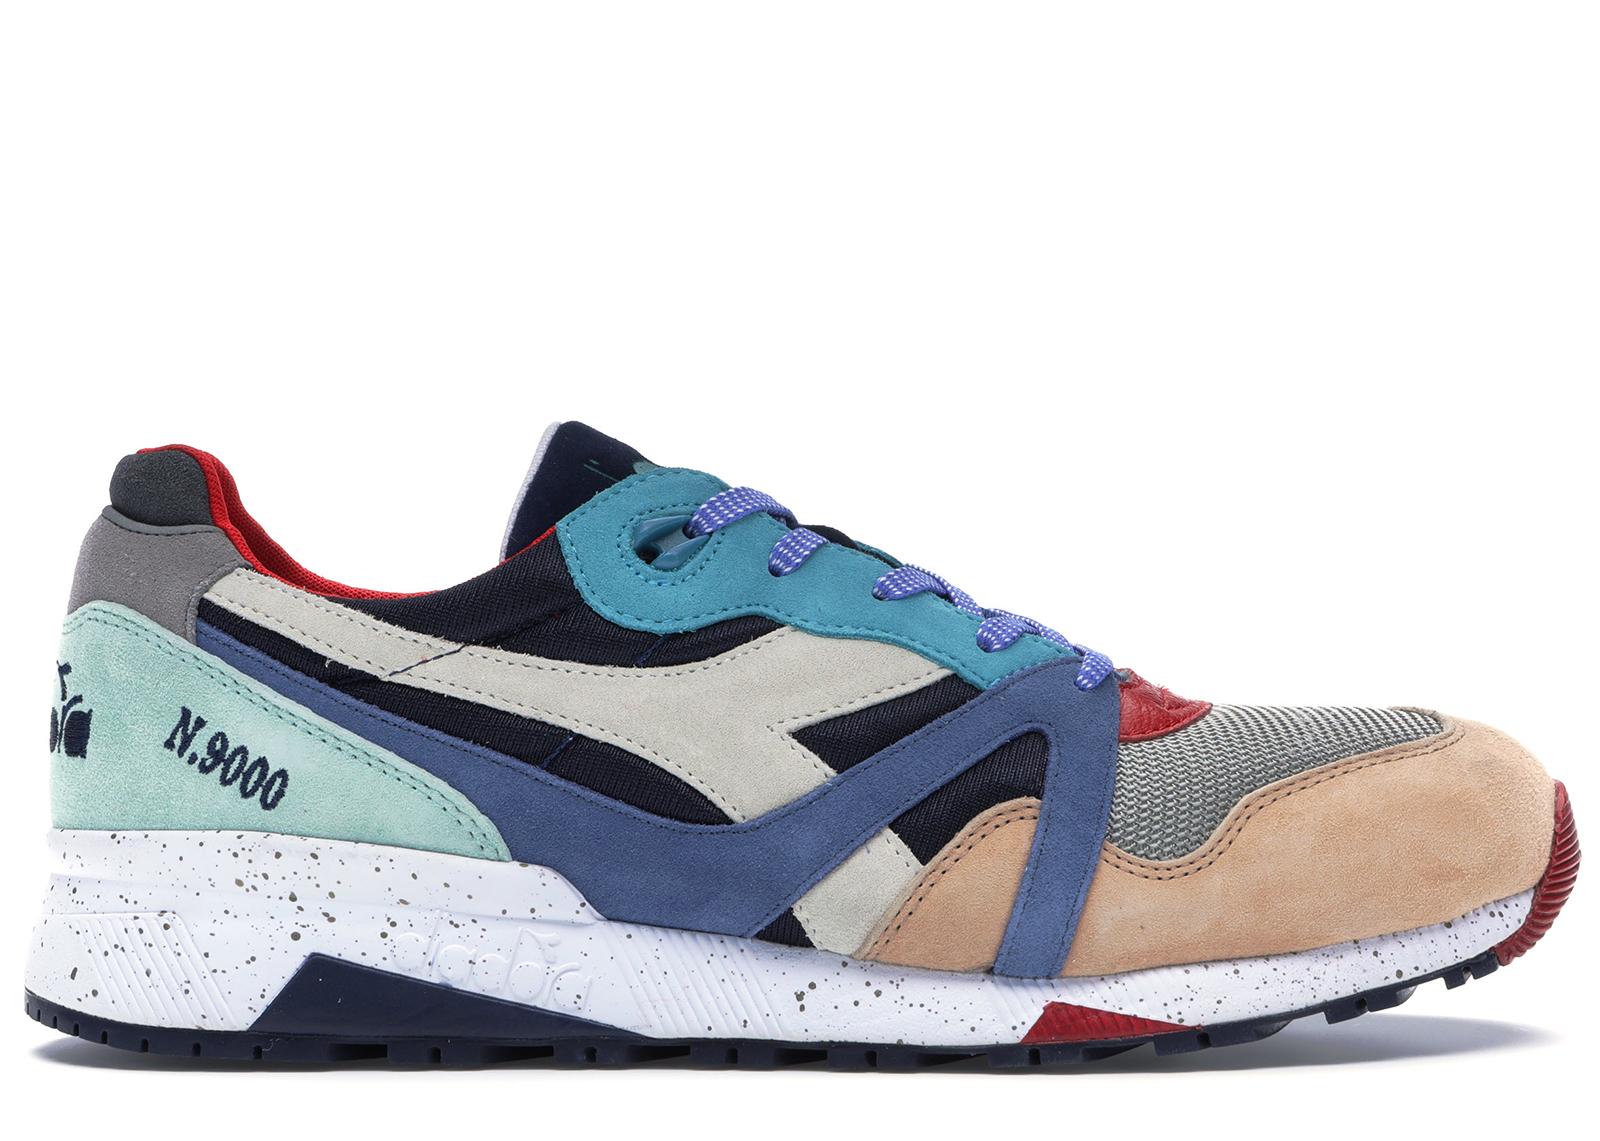 Diadora Size 7.5 Shoes Total Sold